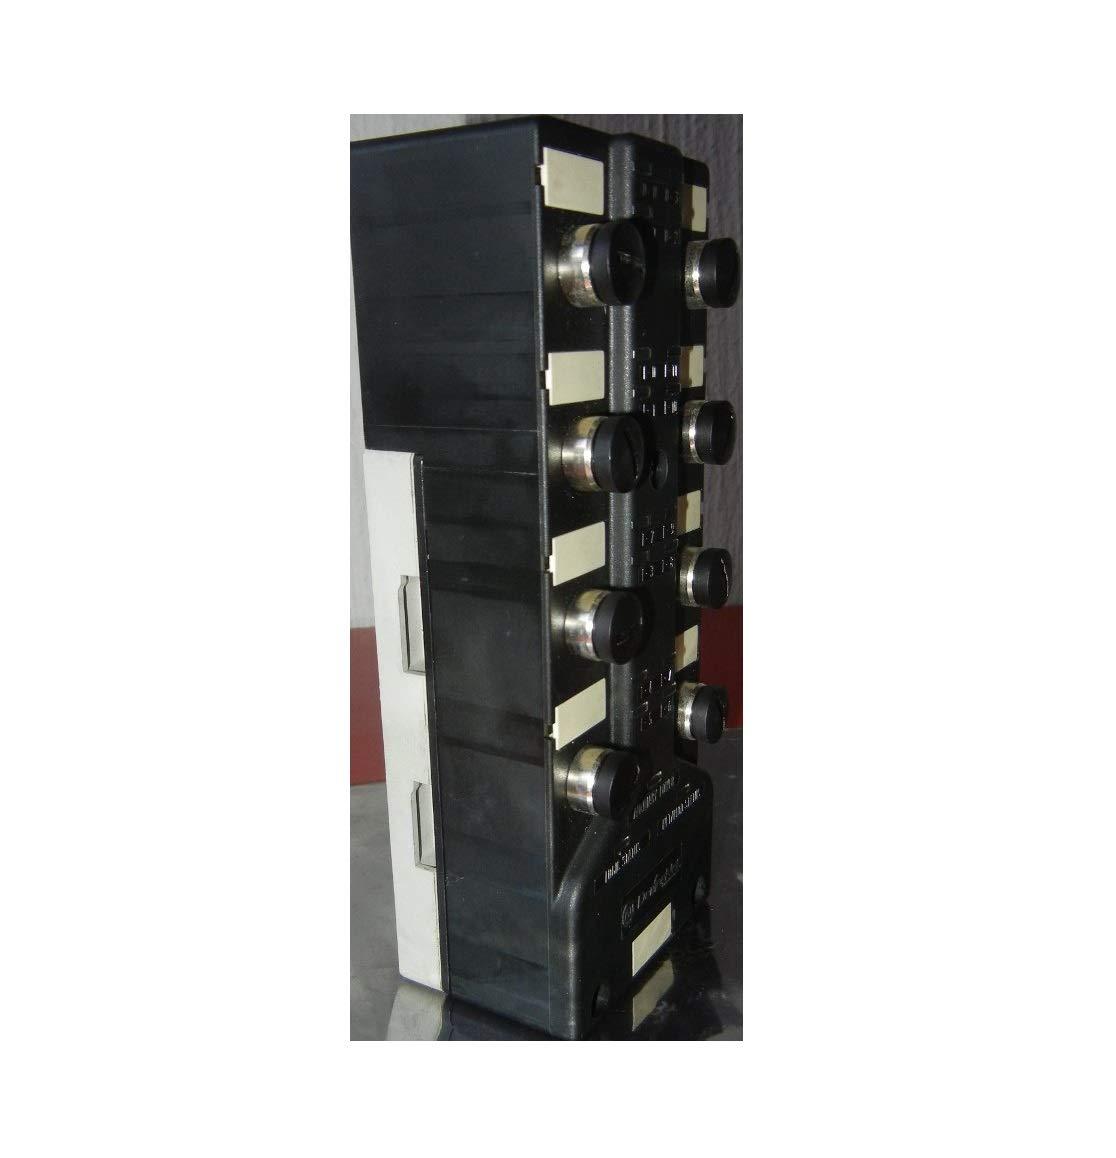 ALLEN BRADLEY 1792D-12BVT4D Discontinued by Manufacturer, 12 Sink/Source Input, 8 Connector, Connector Level Diagnostics, Digital, 4 SOURCING 0.5 AMP Output, I/O Block